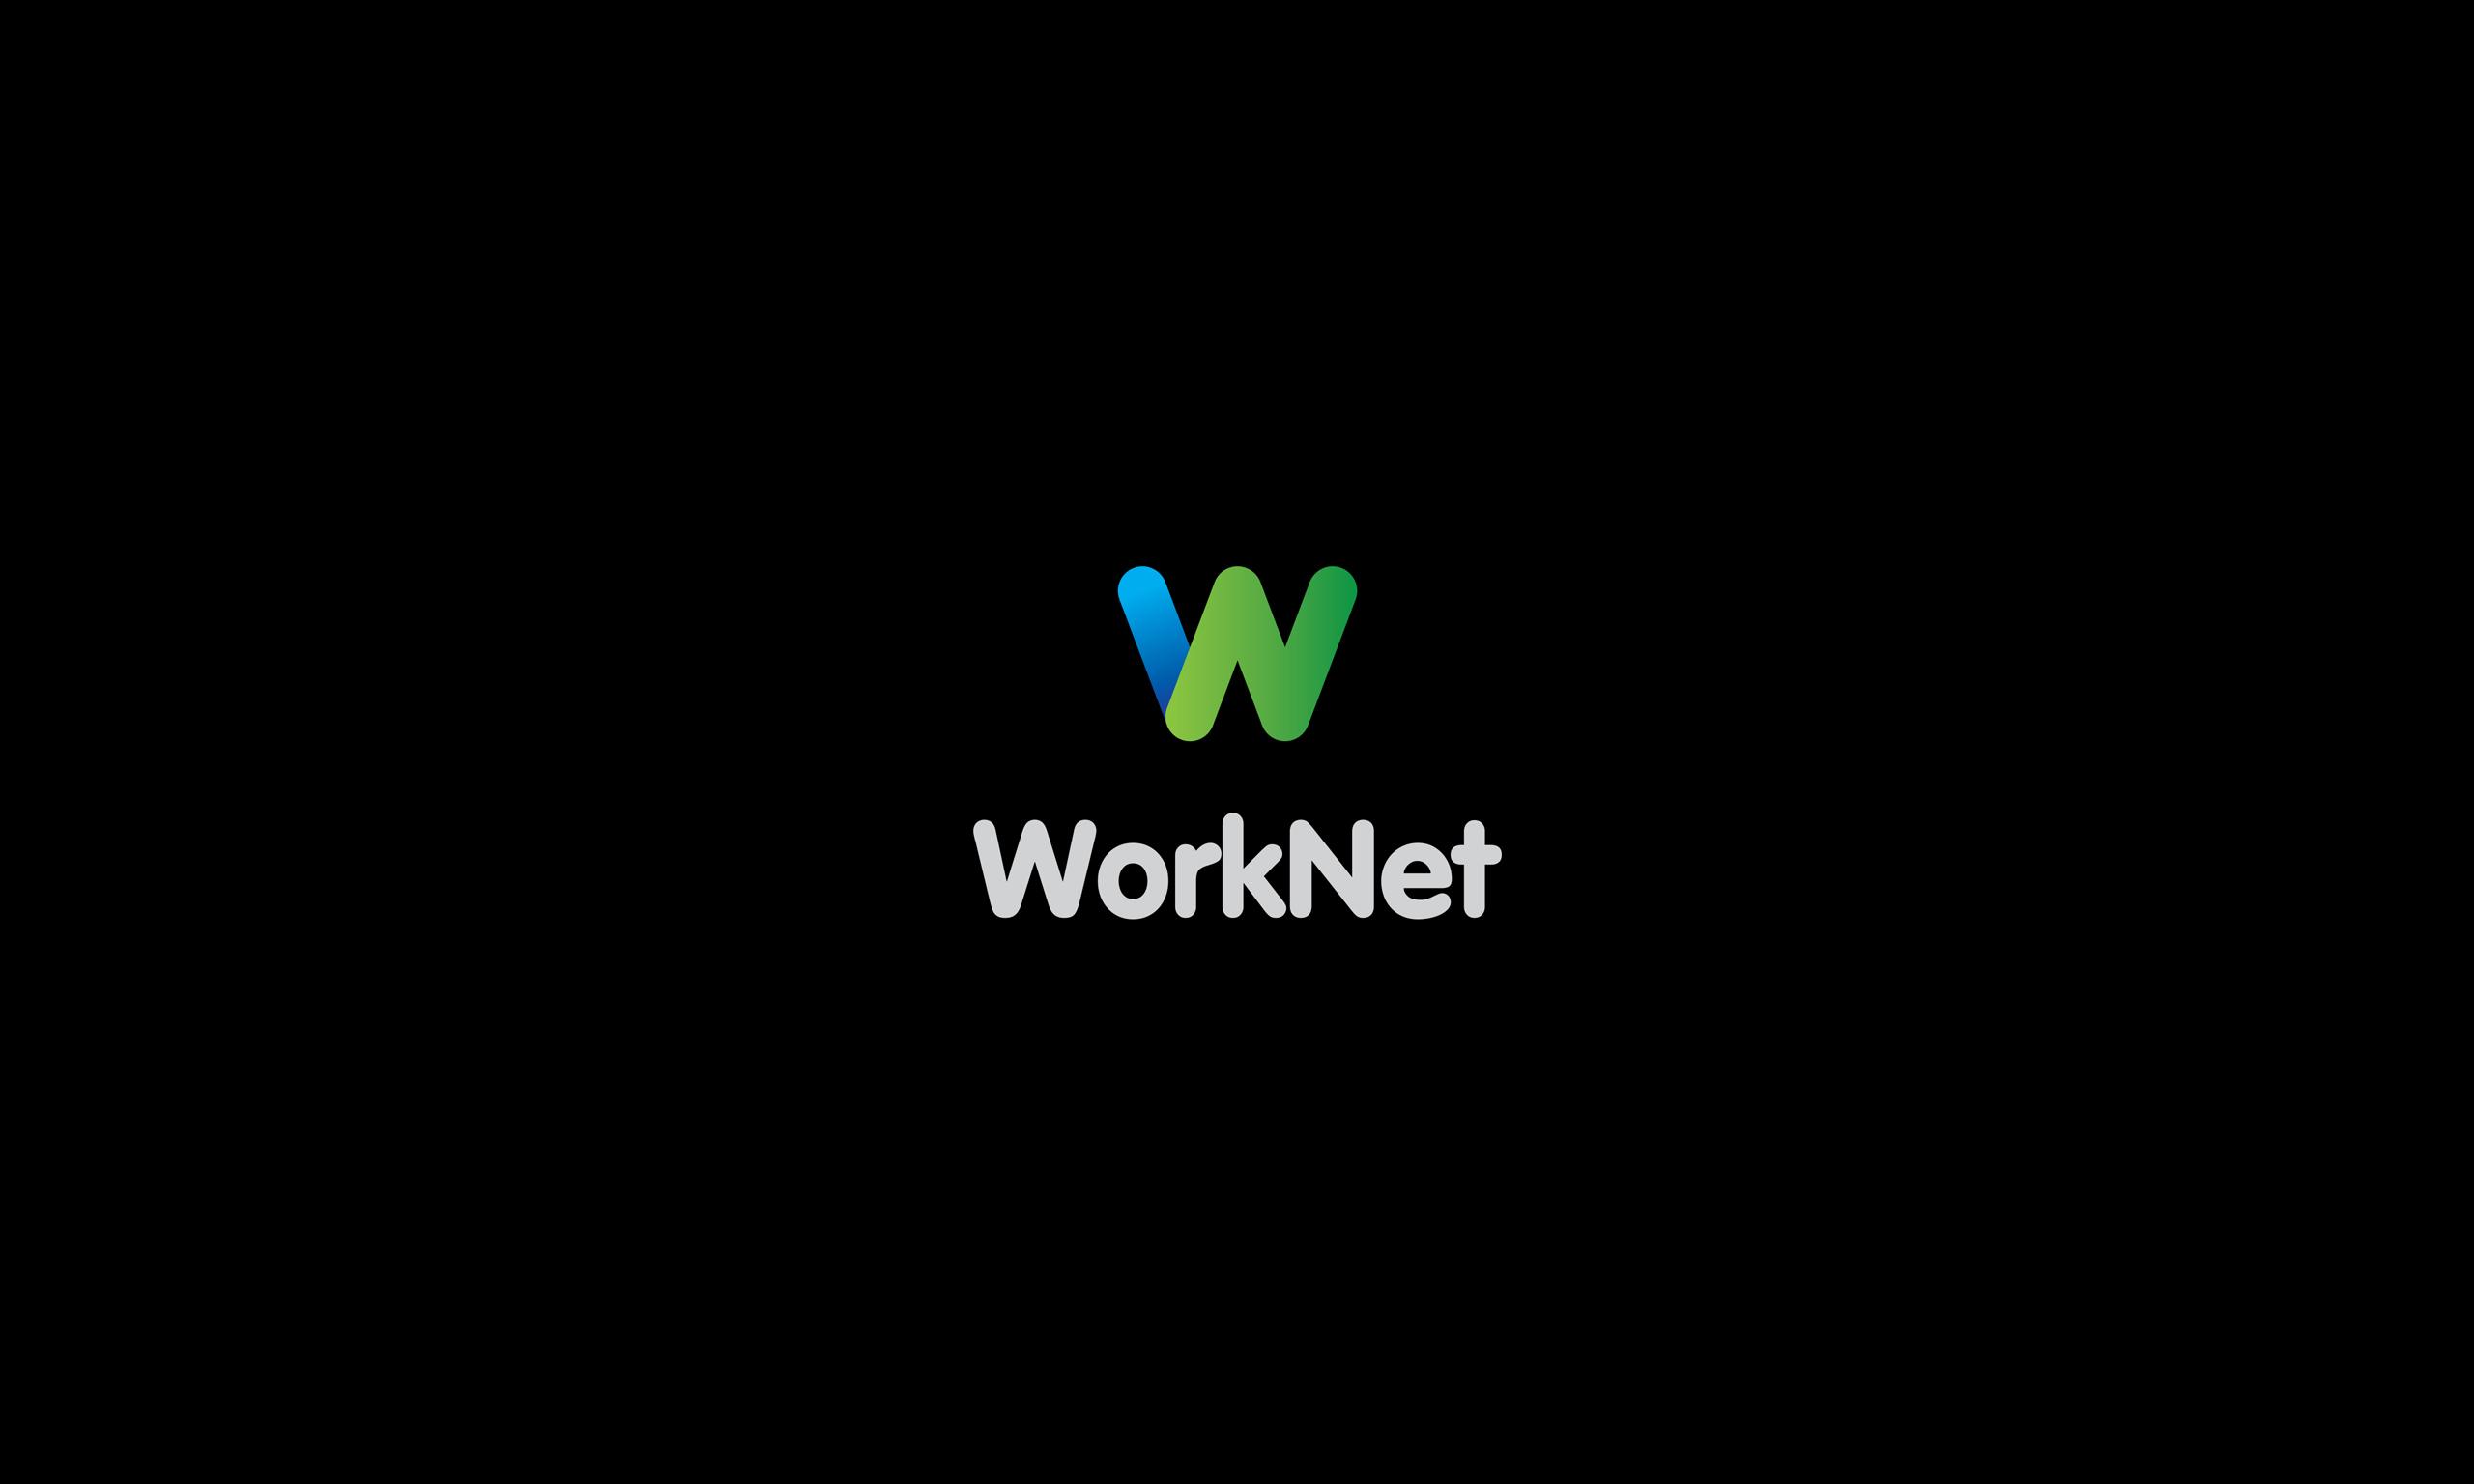 Worknet_Logo_Vertical_BlackBG_w2560_quality100